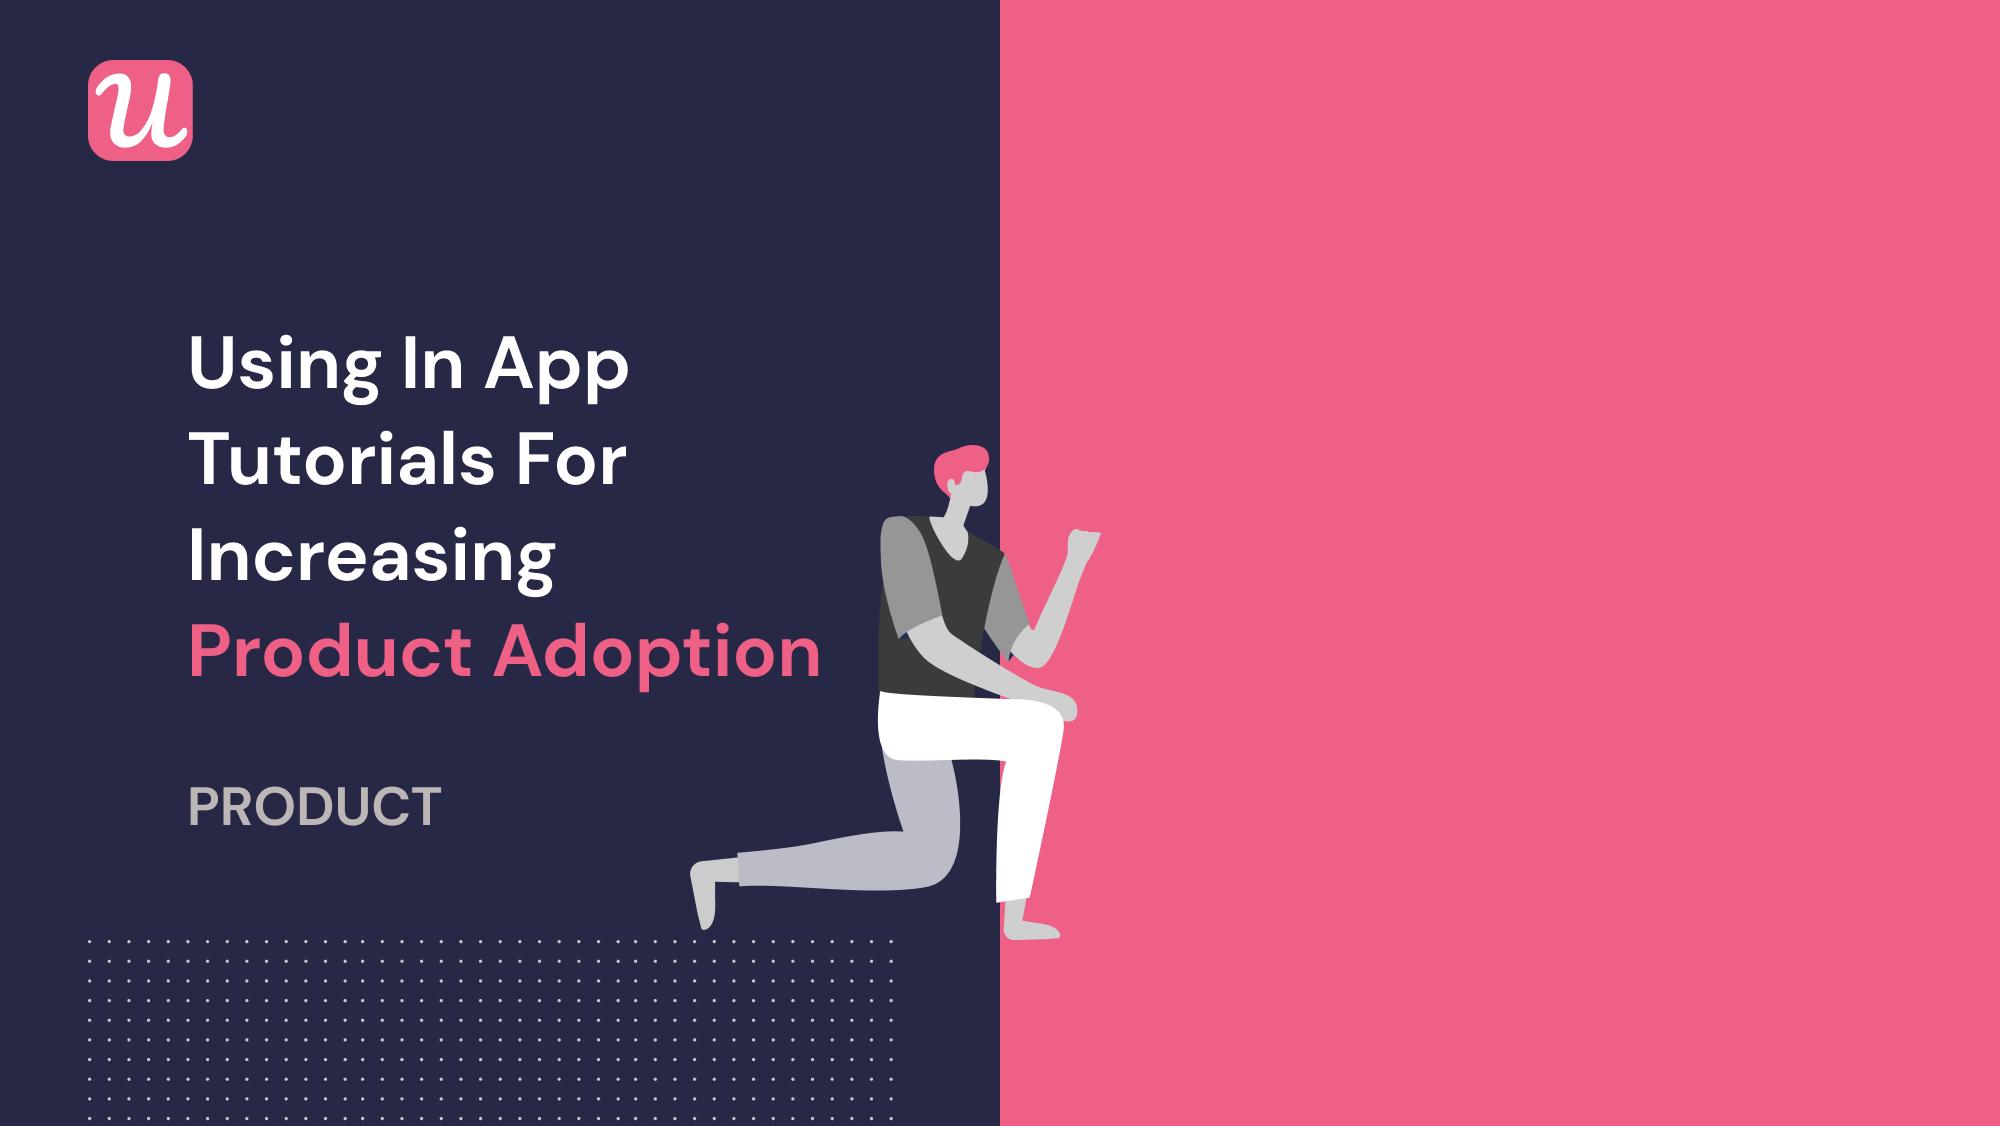 in app tutorials